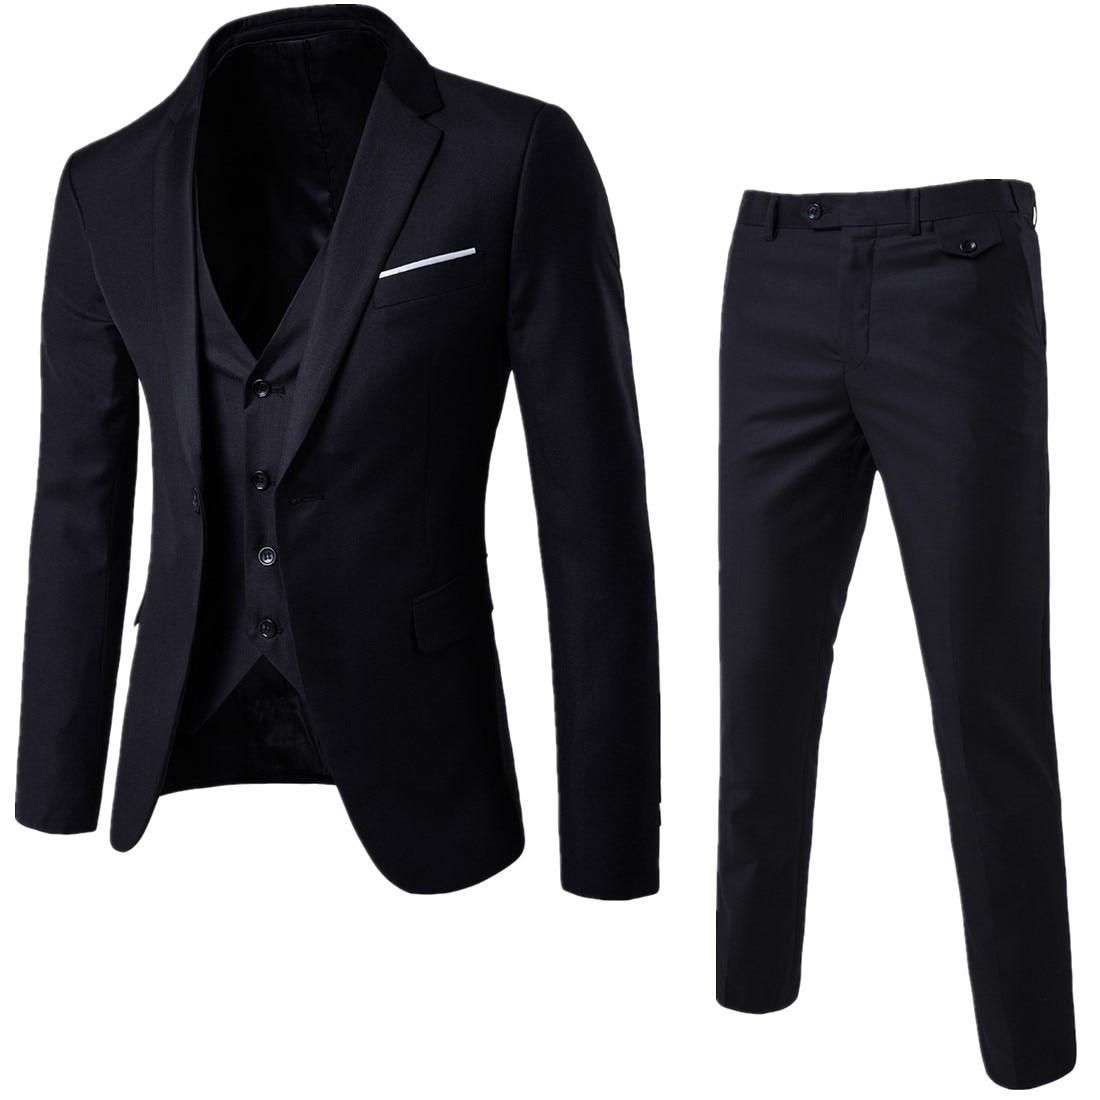 Korean-style Men Suit Three-piece Set Slim Fit Youth One-Button Suit Business Casual Wedding Banquet Men'S Wear